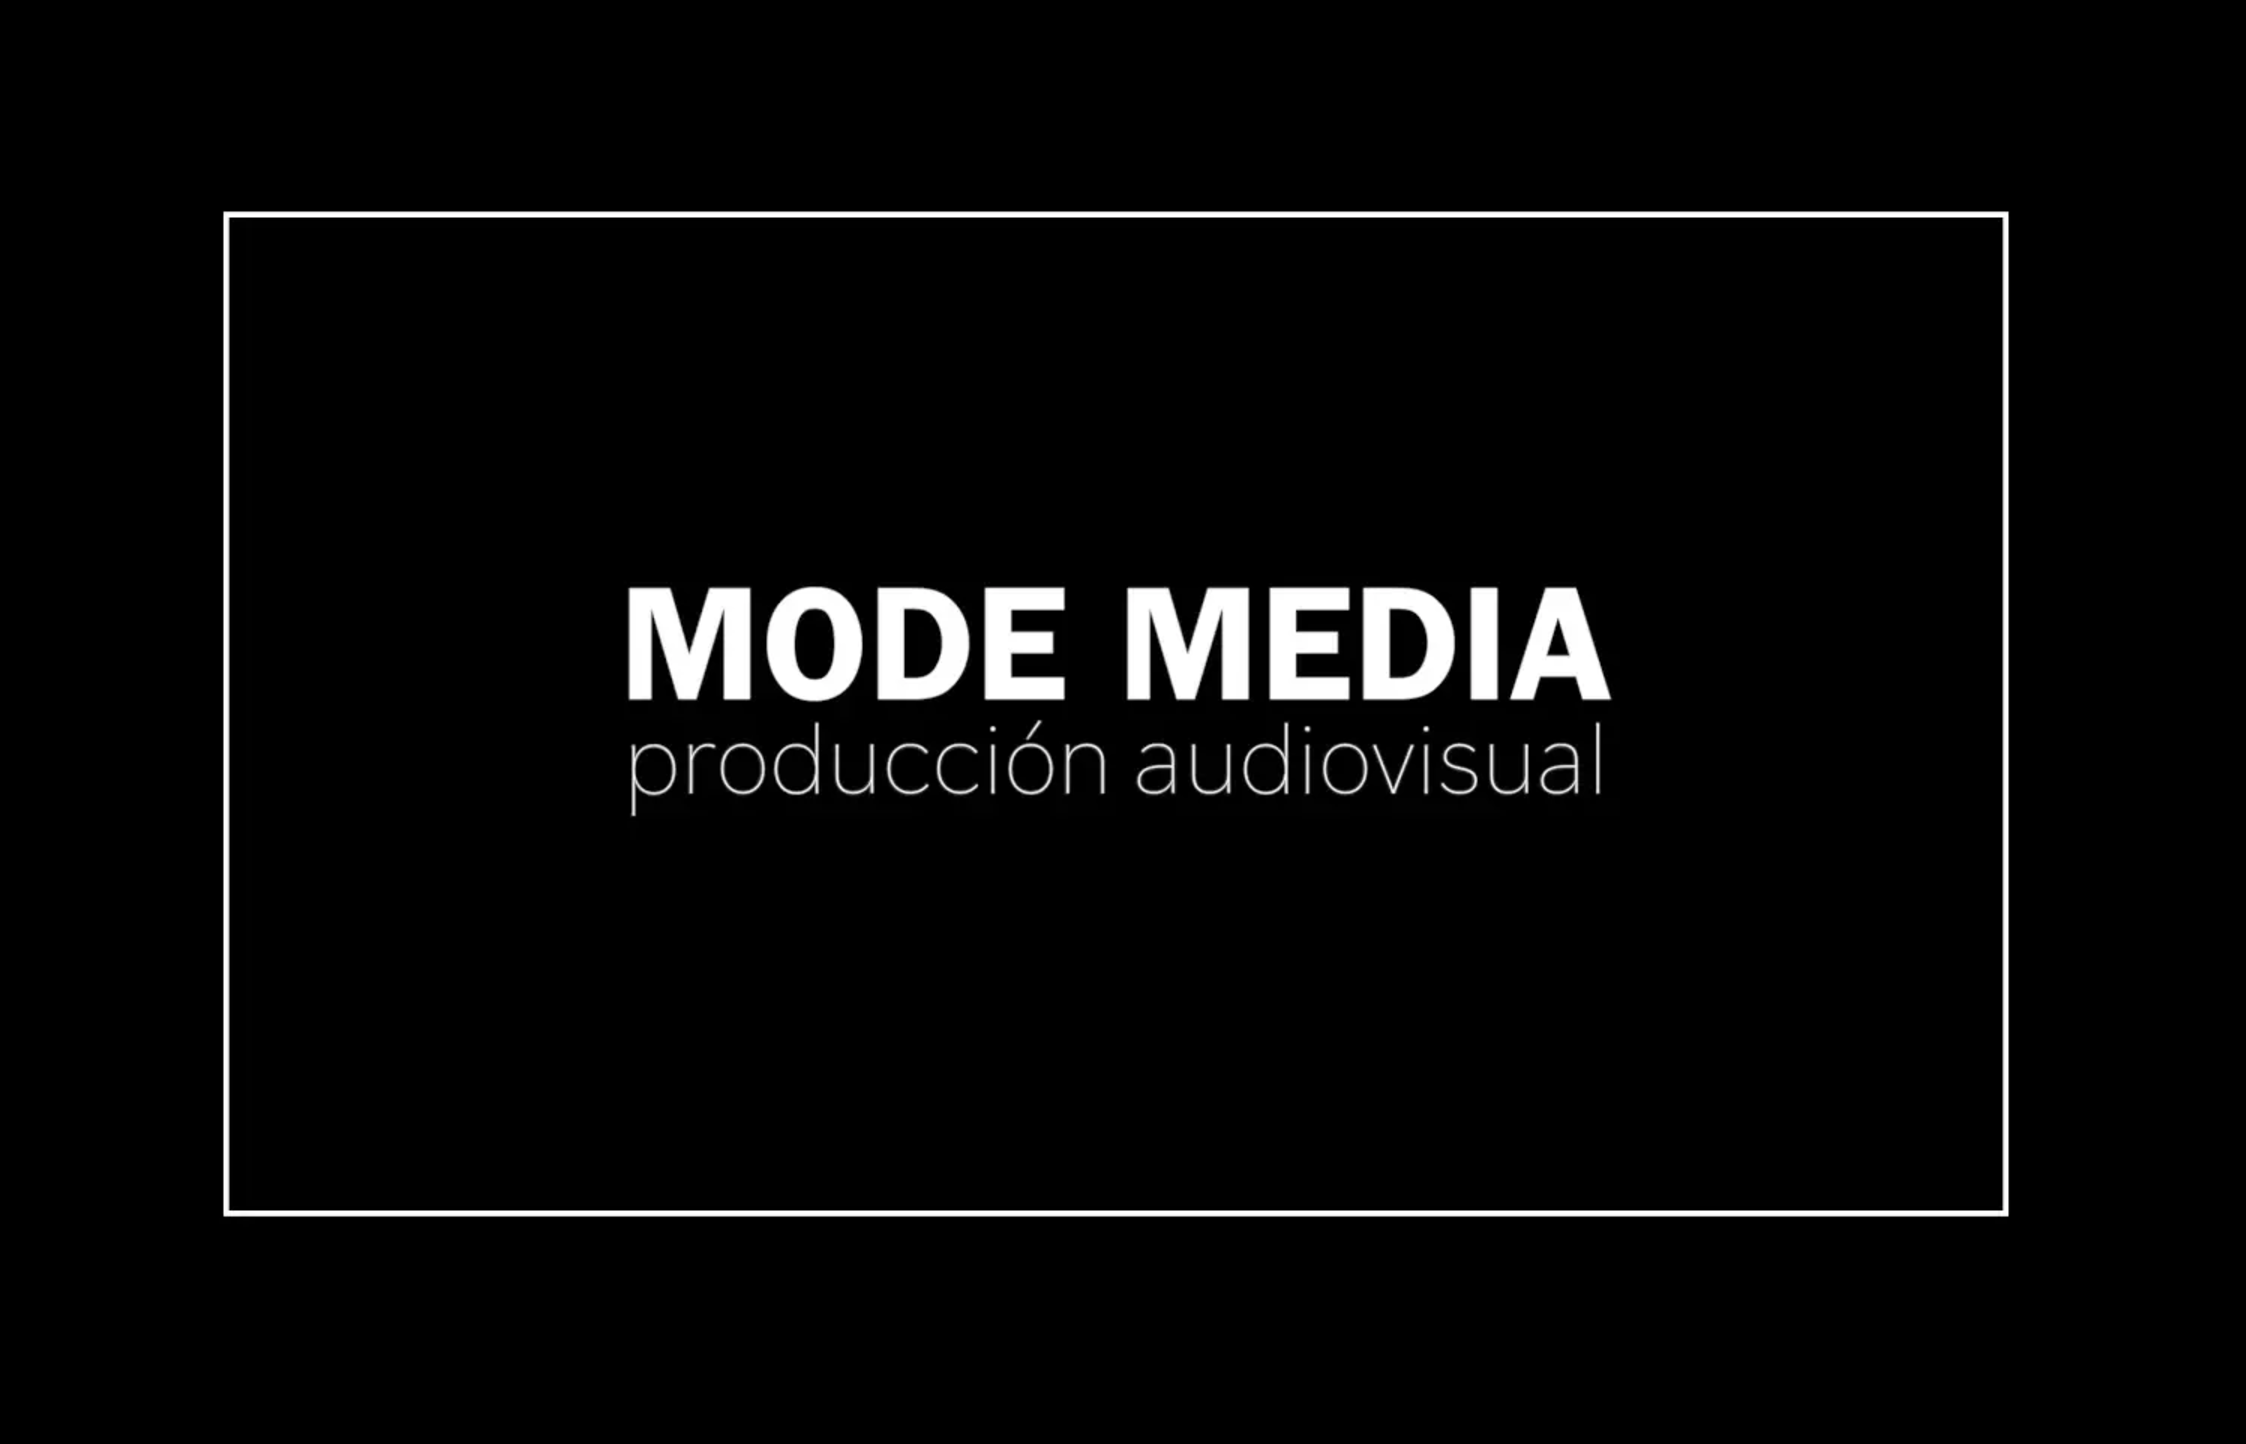 Productora Audiovisual, Mode Media